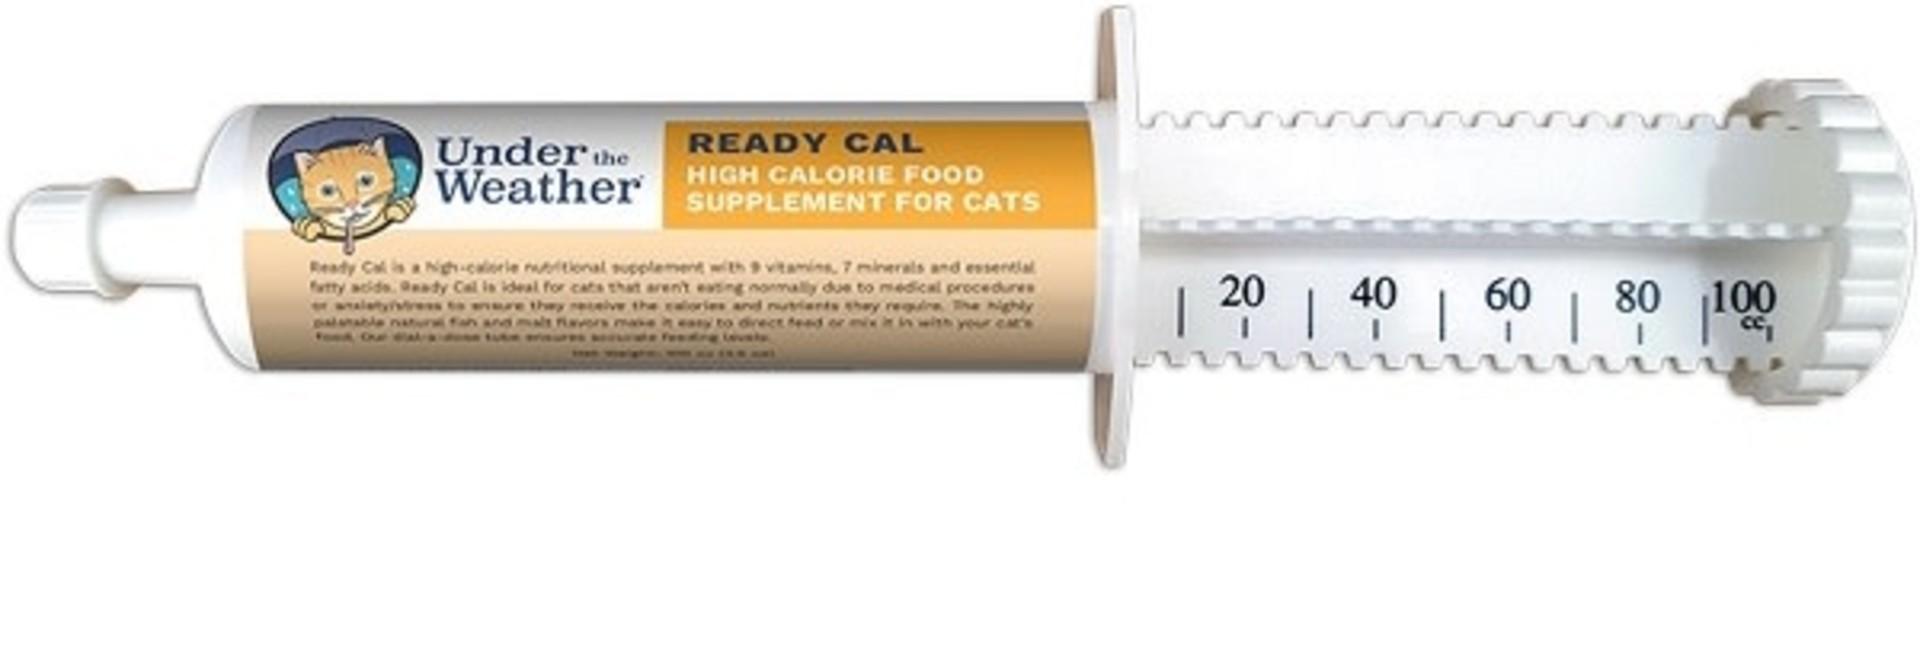 Ready Cal Cat Supplement - 80cc